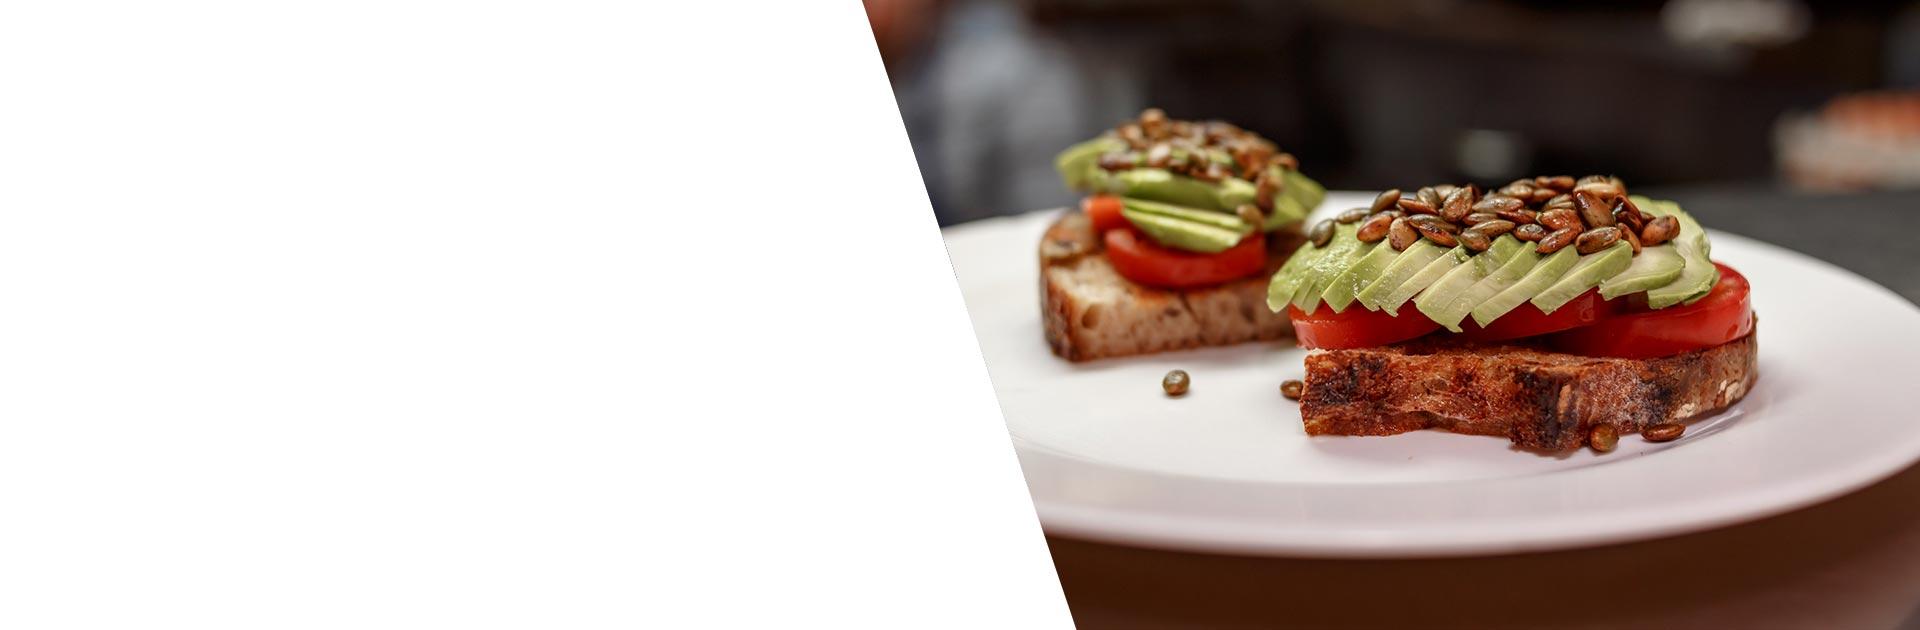 Ananda Fuara Vegetarian Restaurant San Francisco Ananda Fuara Vegetarian Restaurant San Francisco Avocado Toast